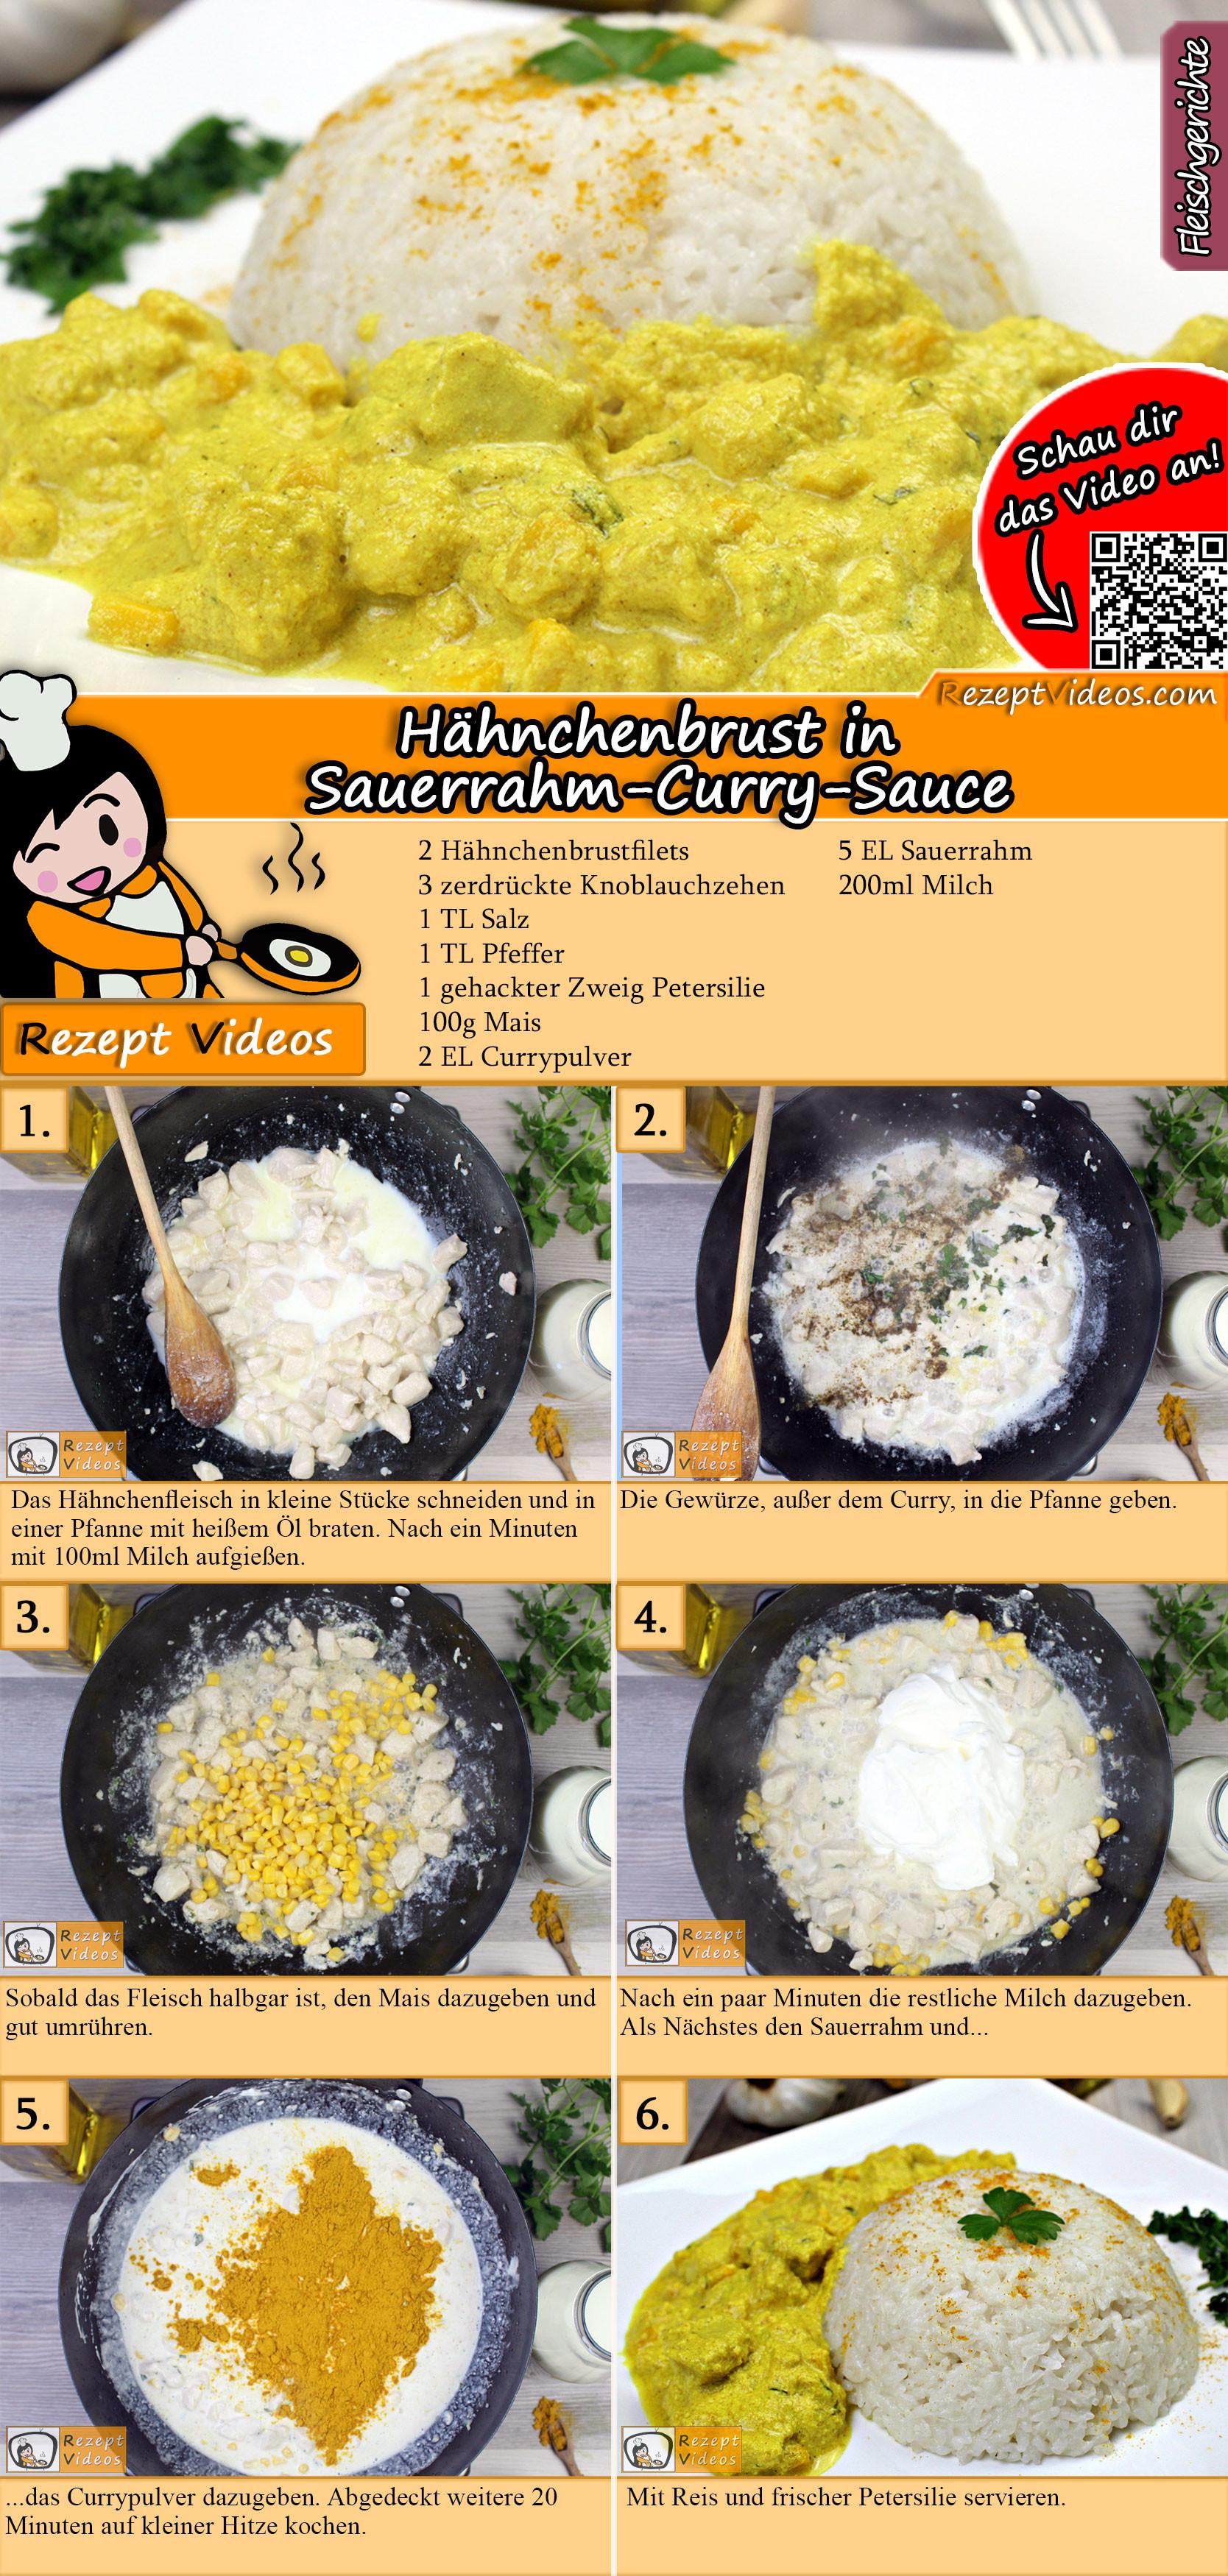 Hähnchenbrust in Sauerrahm-Curry-Sauce Rezept mit Video